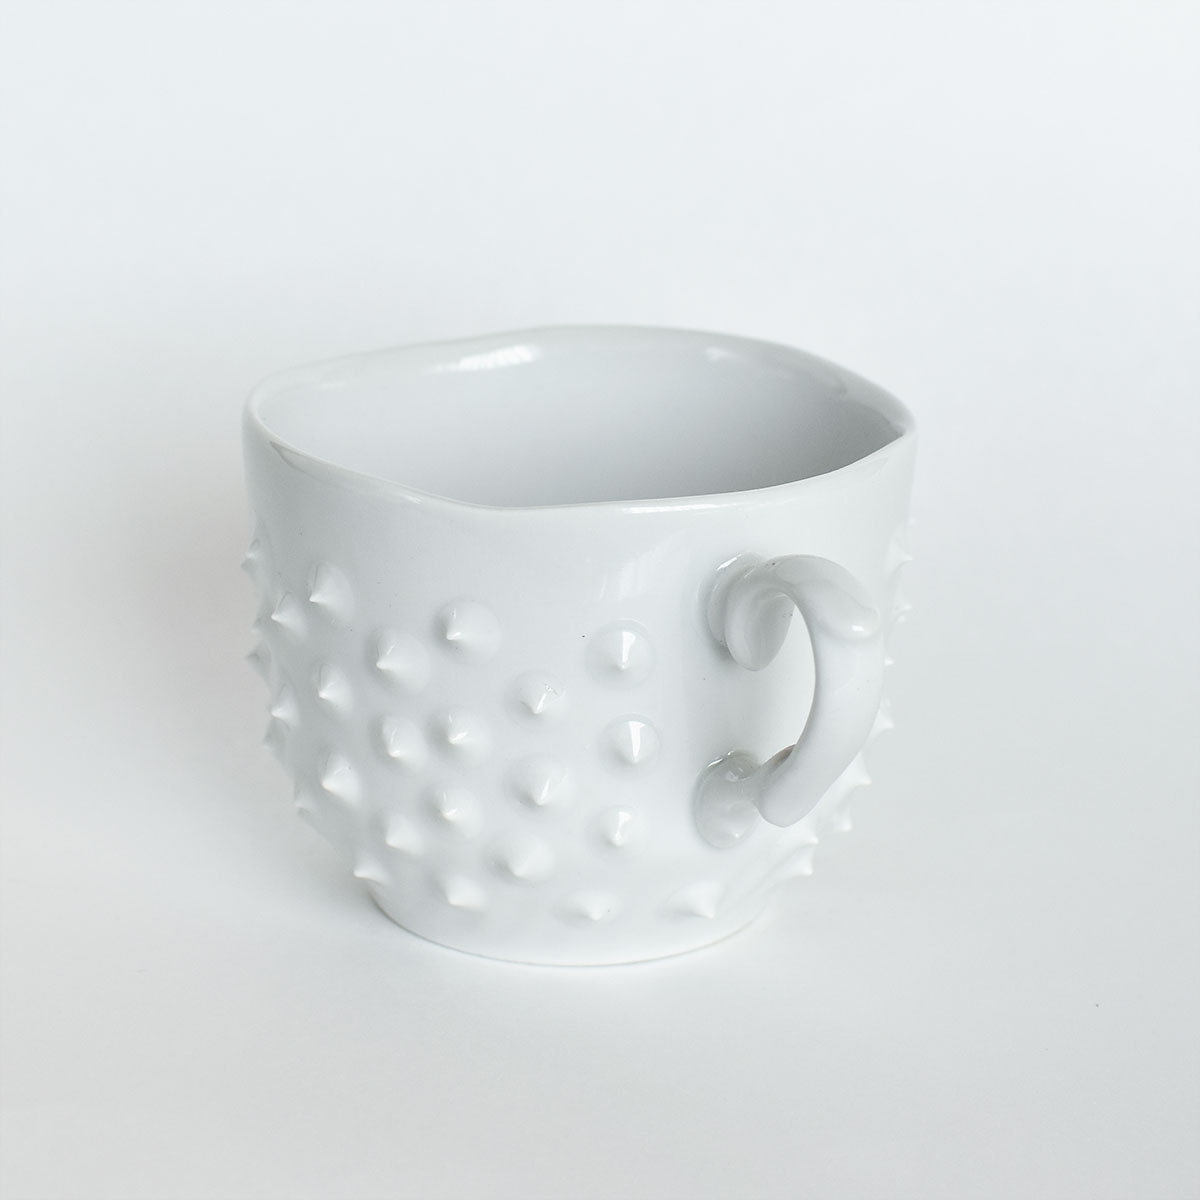 картинка Белая чашка с шипами - DishWishes.Ru